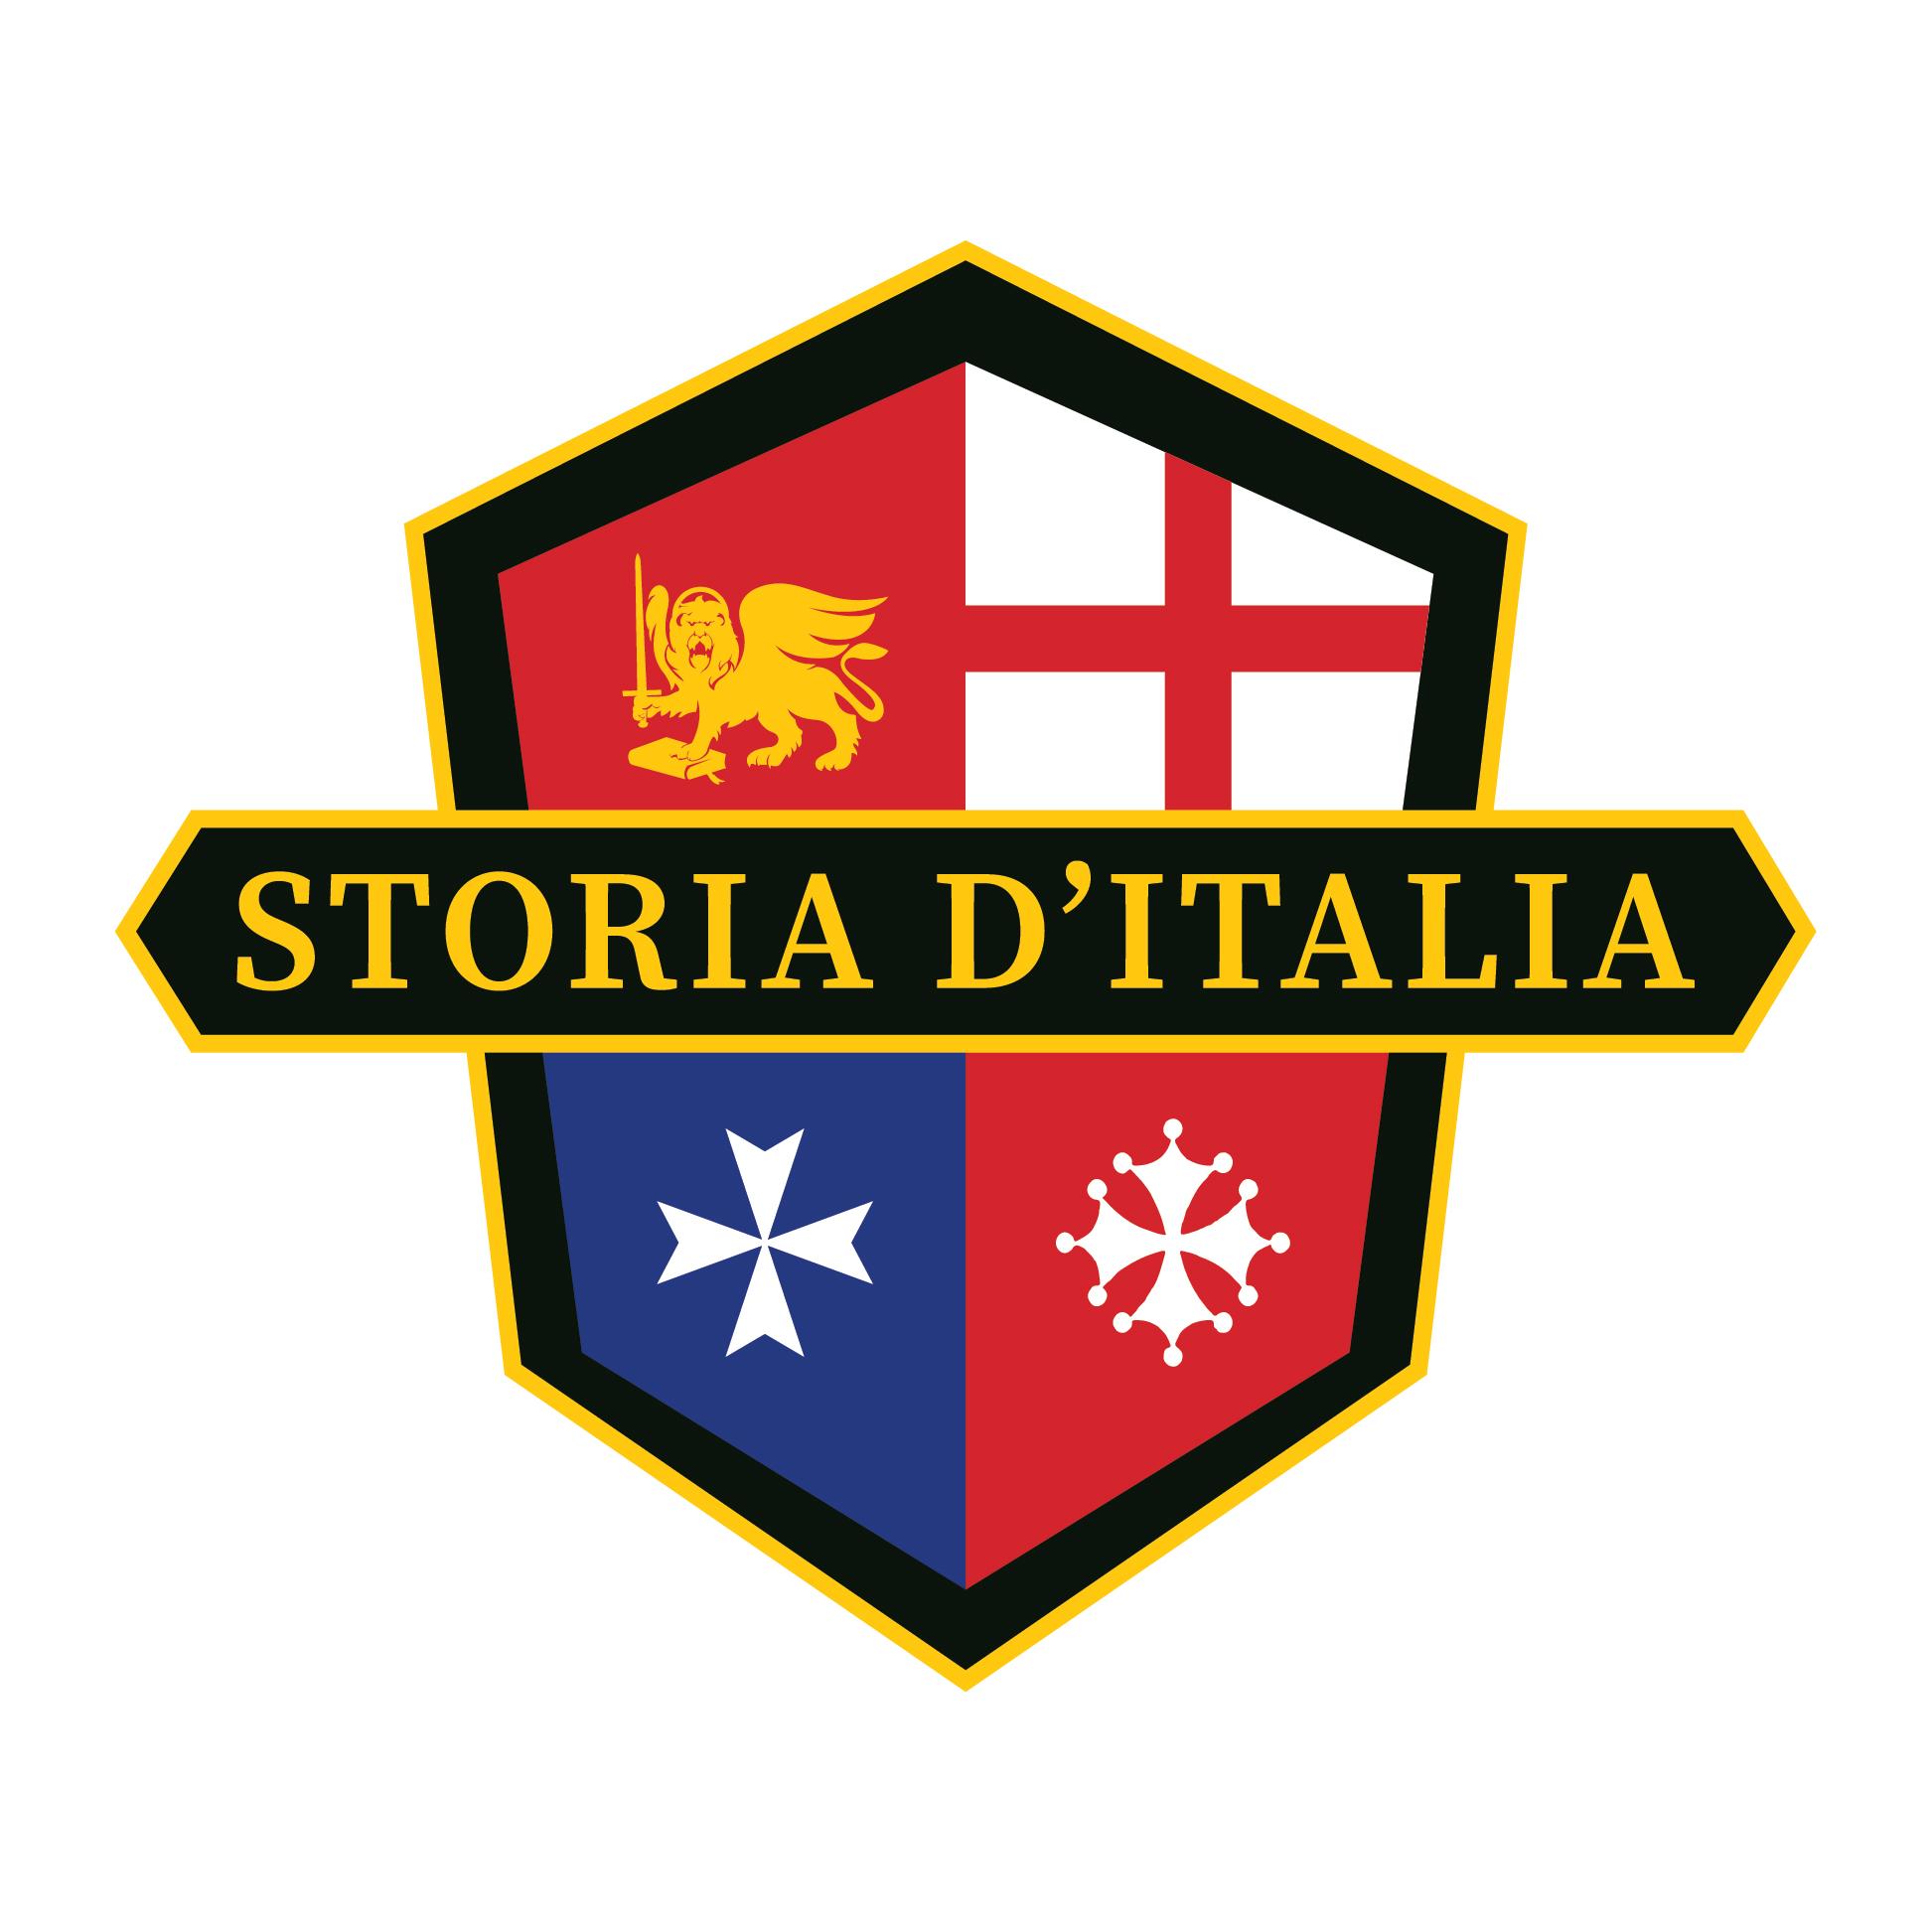 storia-ditalia-logos-01